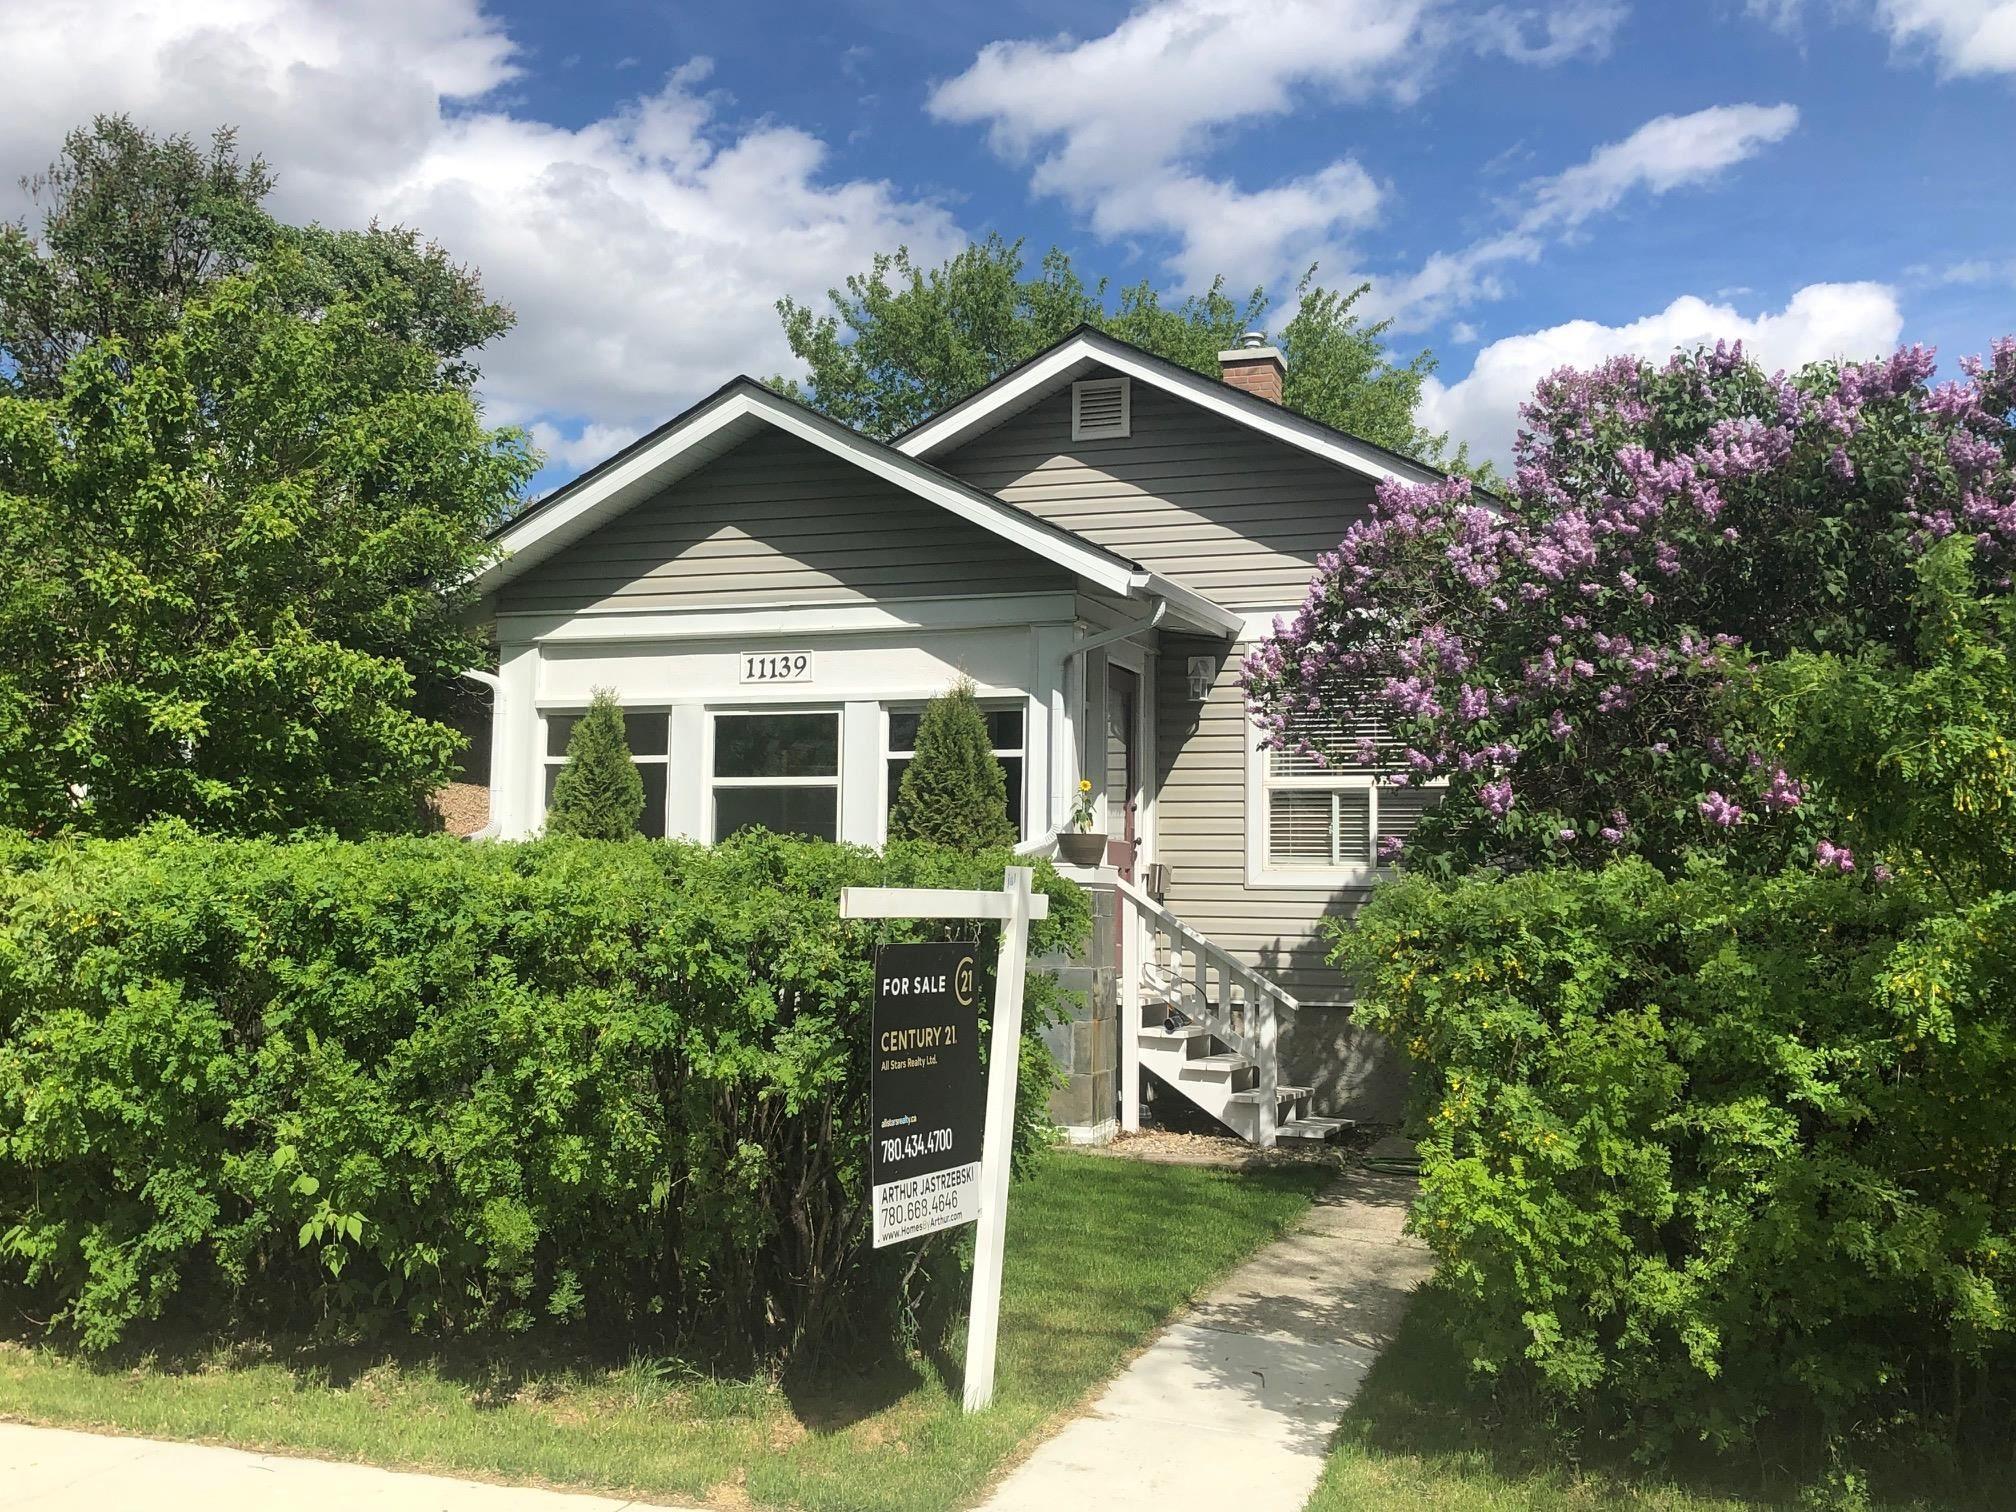 Main Photo: 11139 127 Street in Edmonton: Zone 07 House for sale : MLS®# E4252998